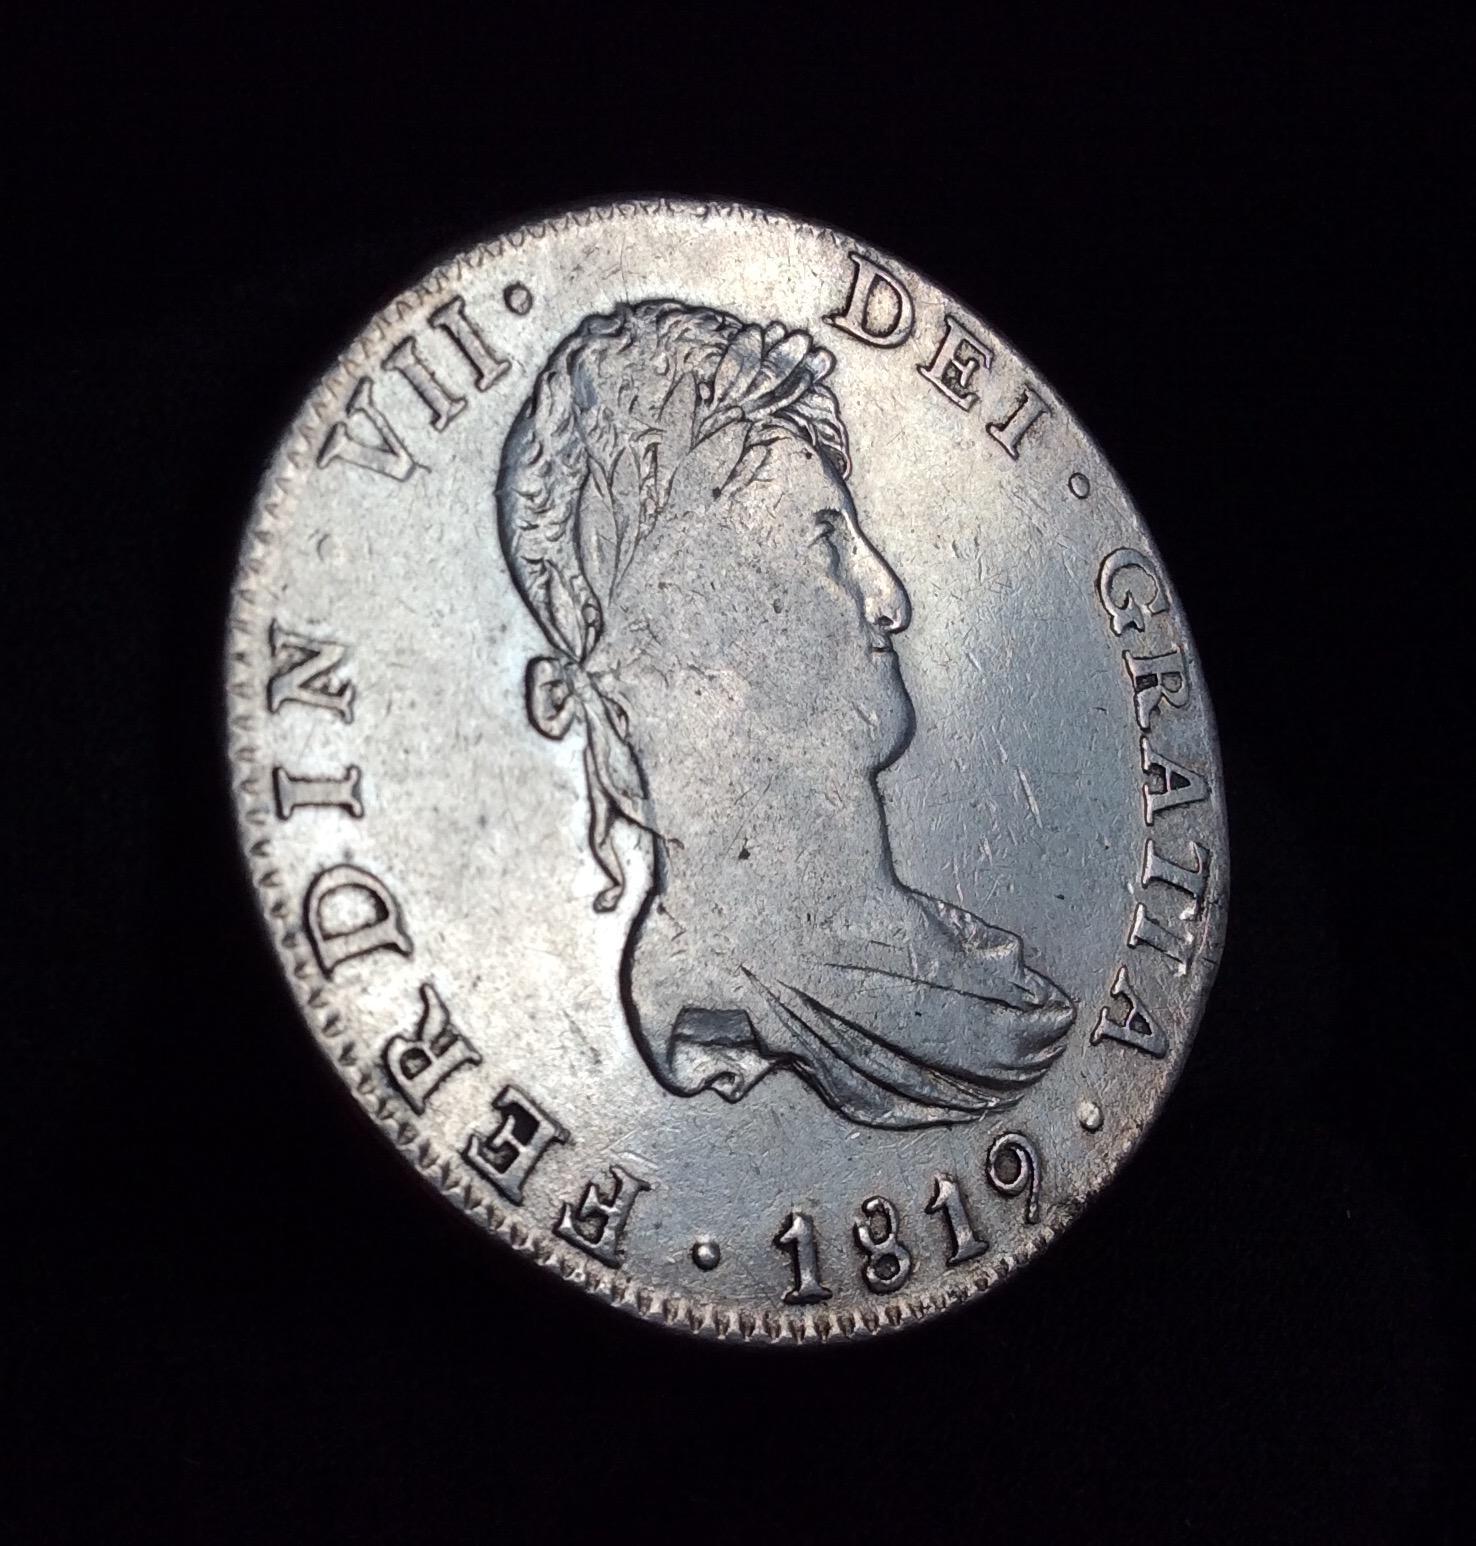 8 REALES PLATA 1819 - FERNANDO VII - CECA DE MÉXICO